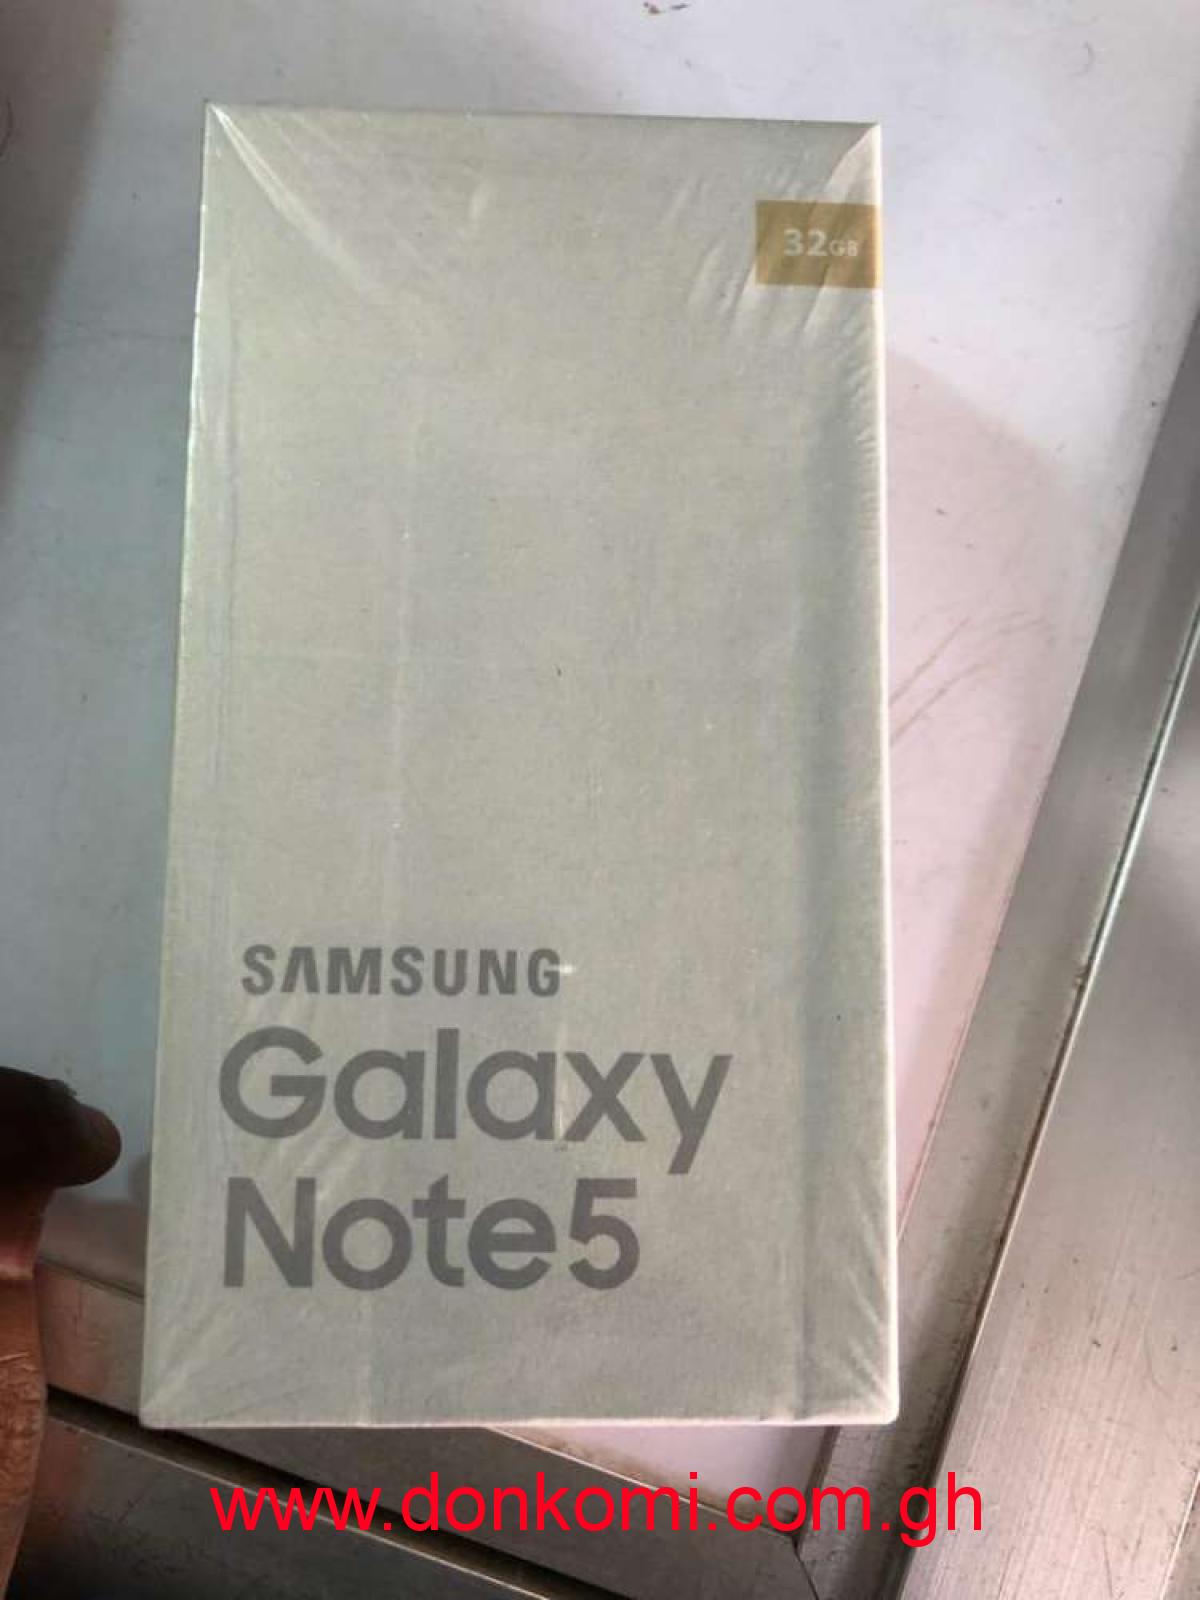 Samsung Galaxy Note5 in box (Uk)